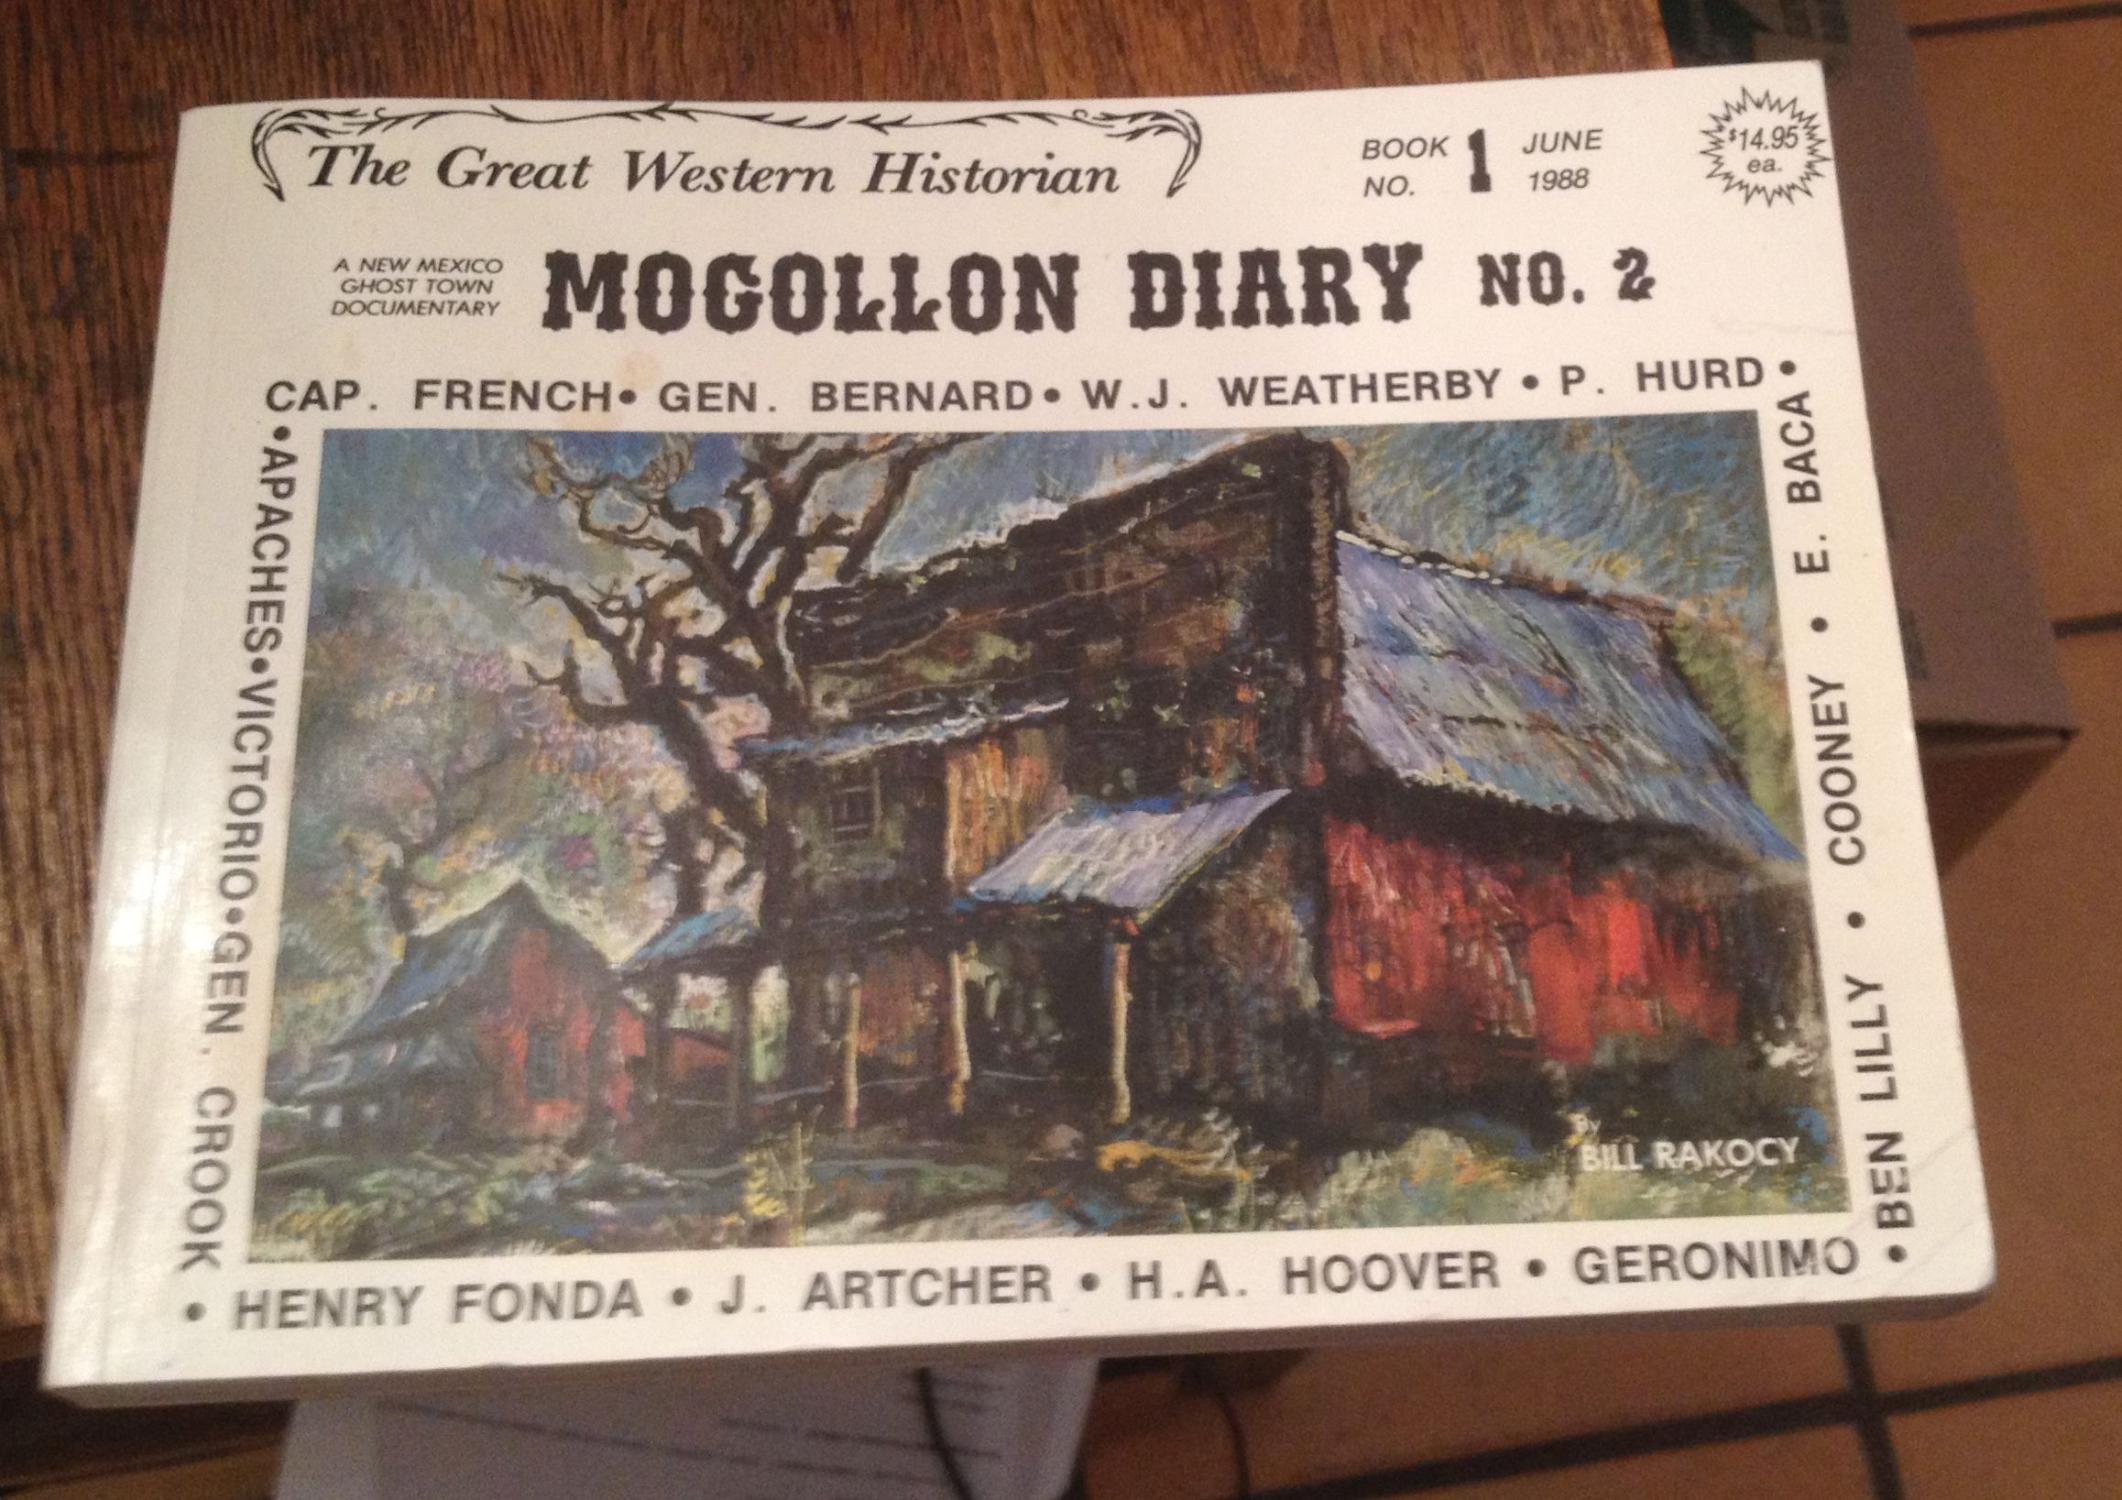 Mogollon Diary No.2 - Book No.1, June 1988 Rakocy, Bill